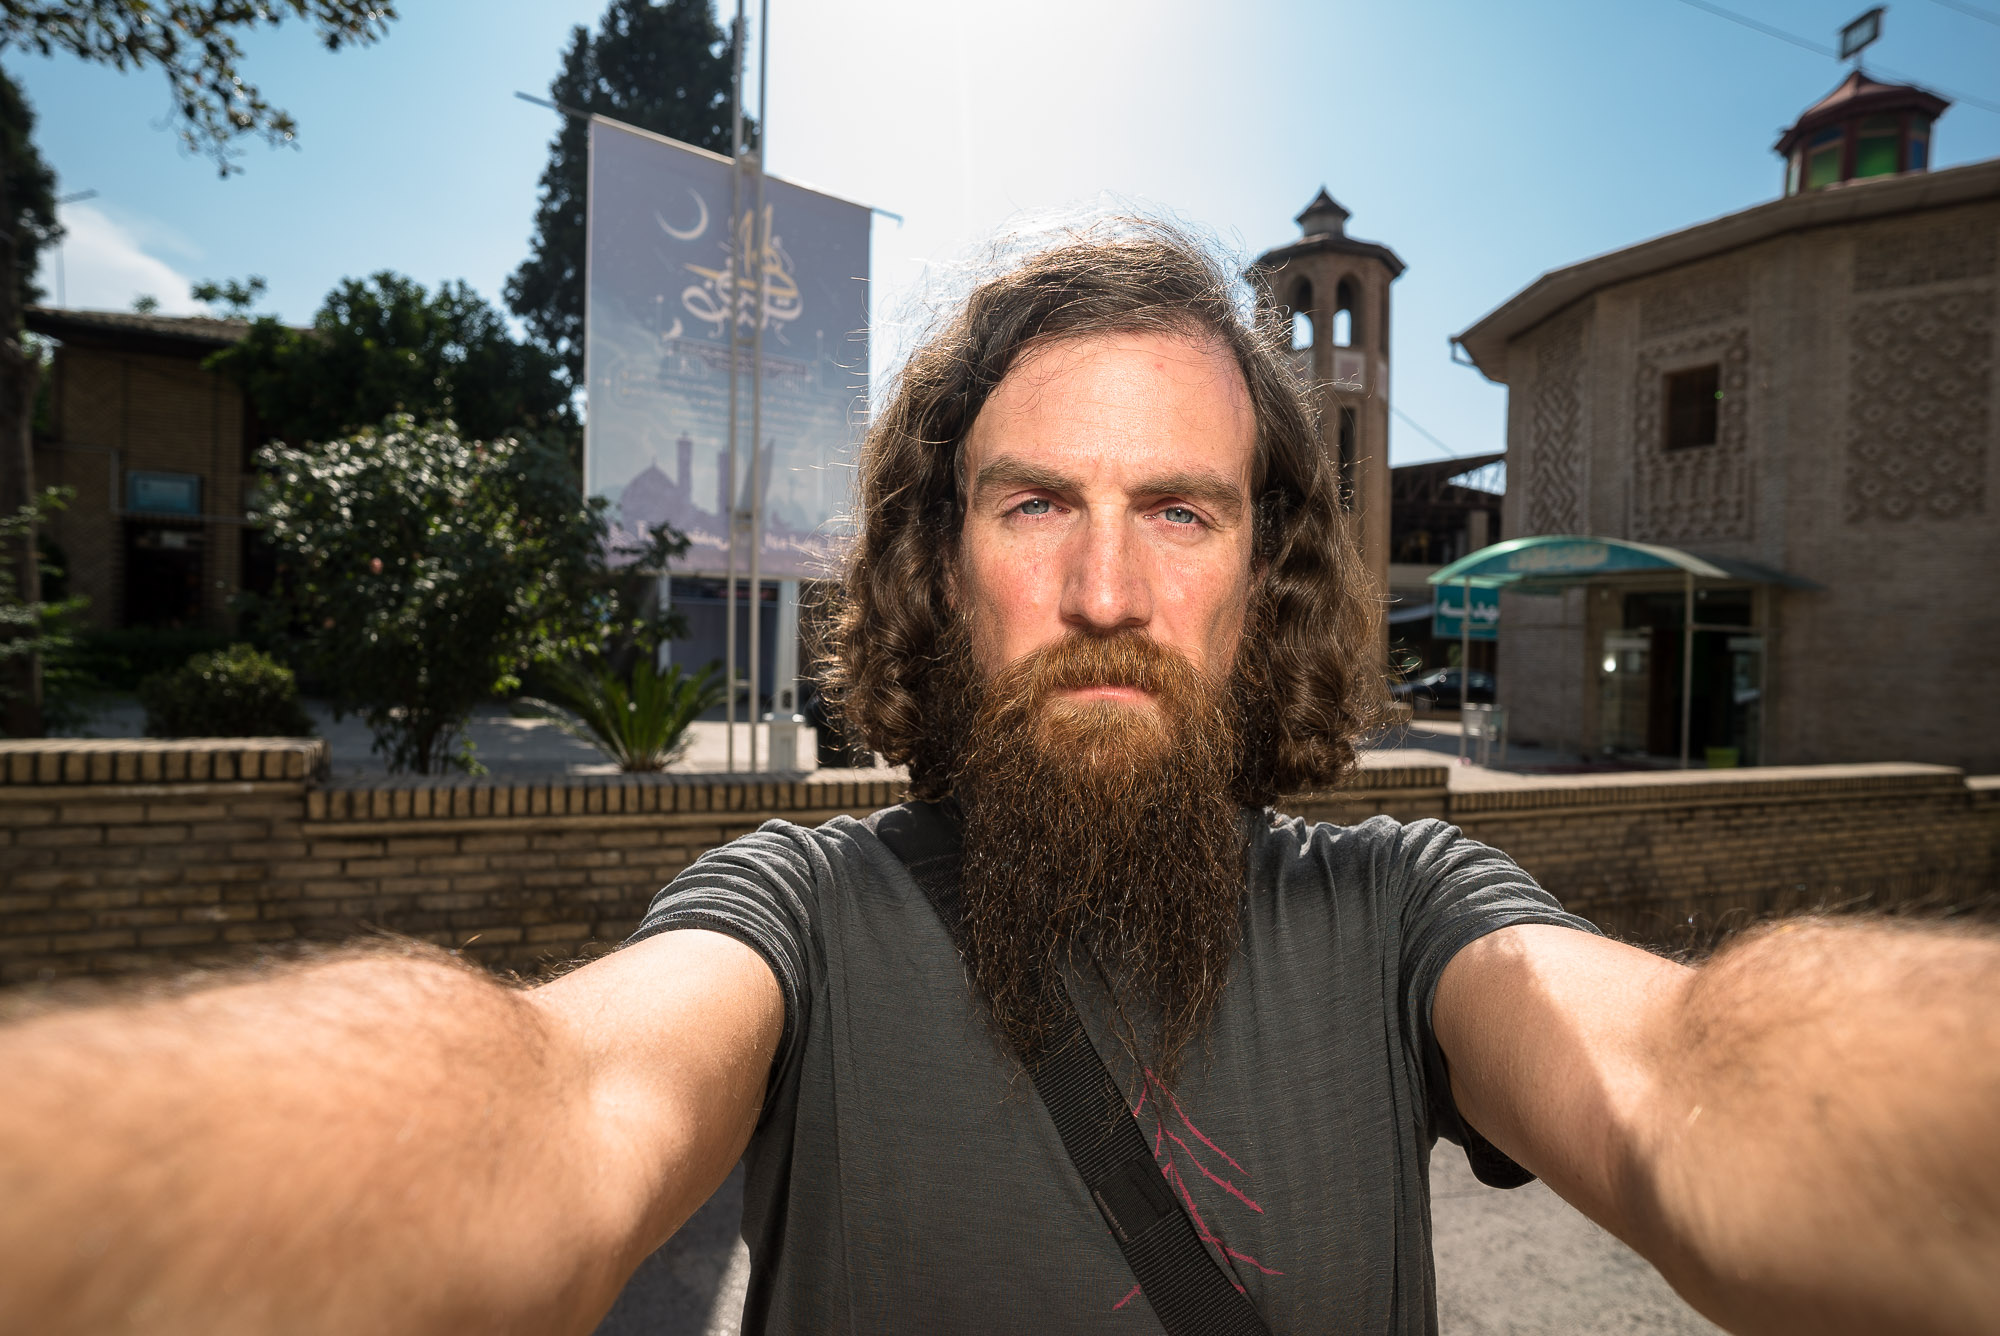 Gorgan selfie flash no shade